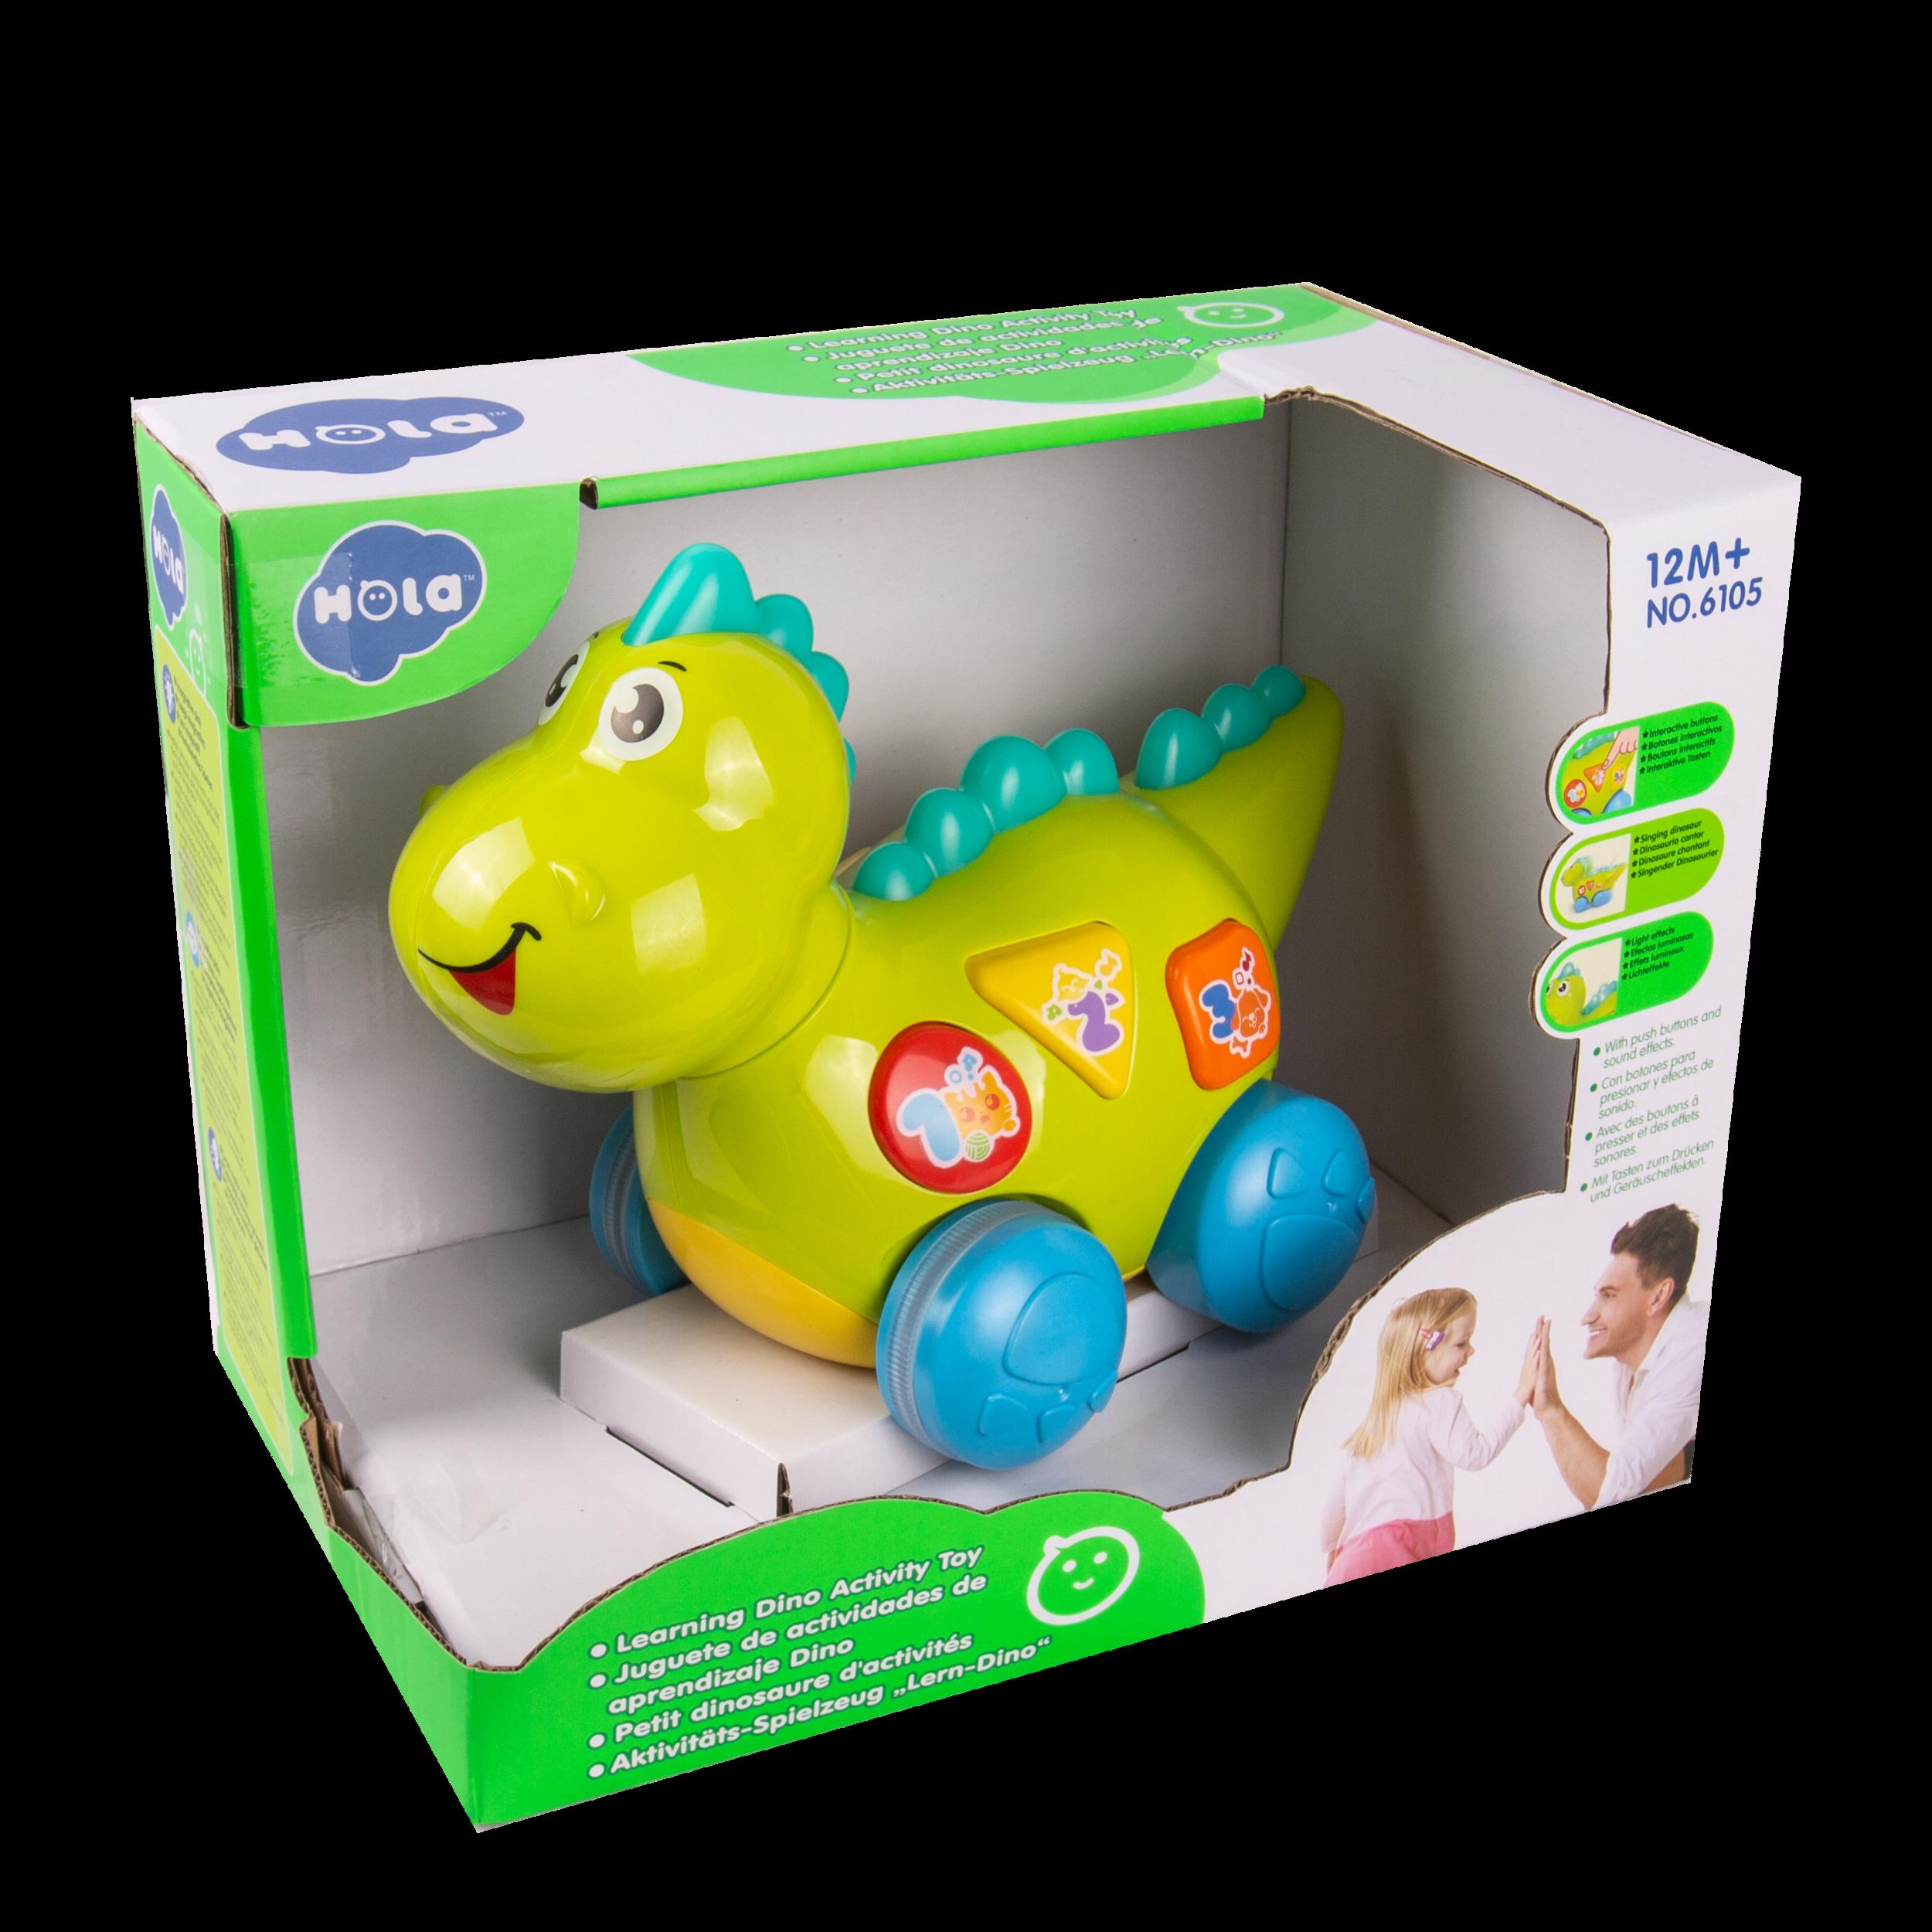 Juguete de Actividades de Aprendizaje Dino - Código: 6105